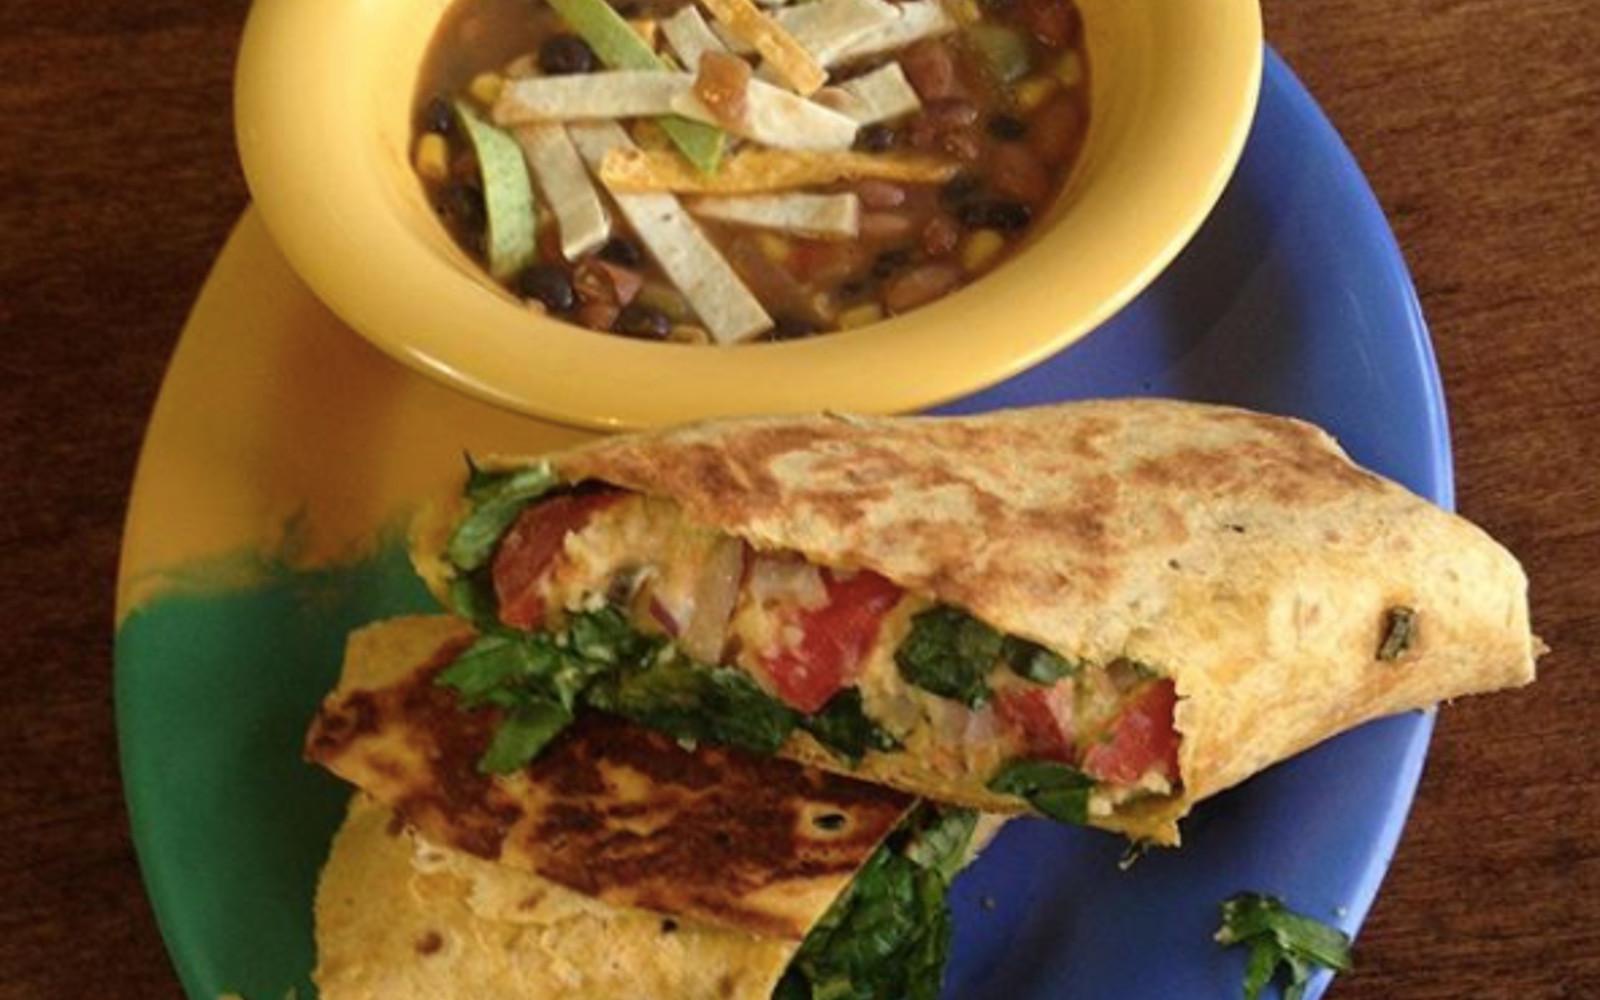 Vegan Tuna Wrap & a bowl of Tortilla Soup